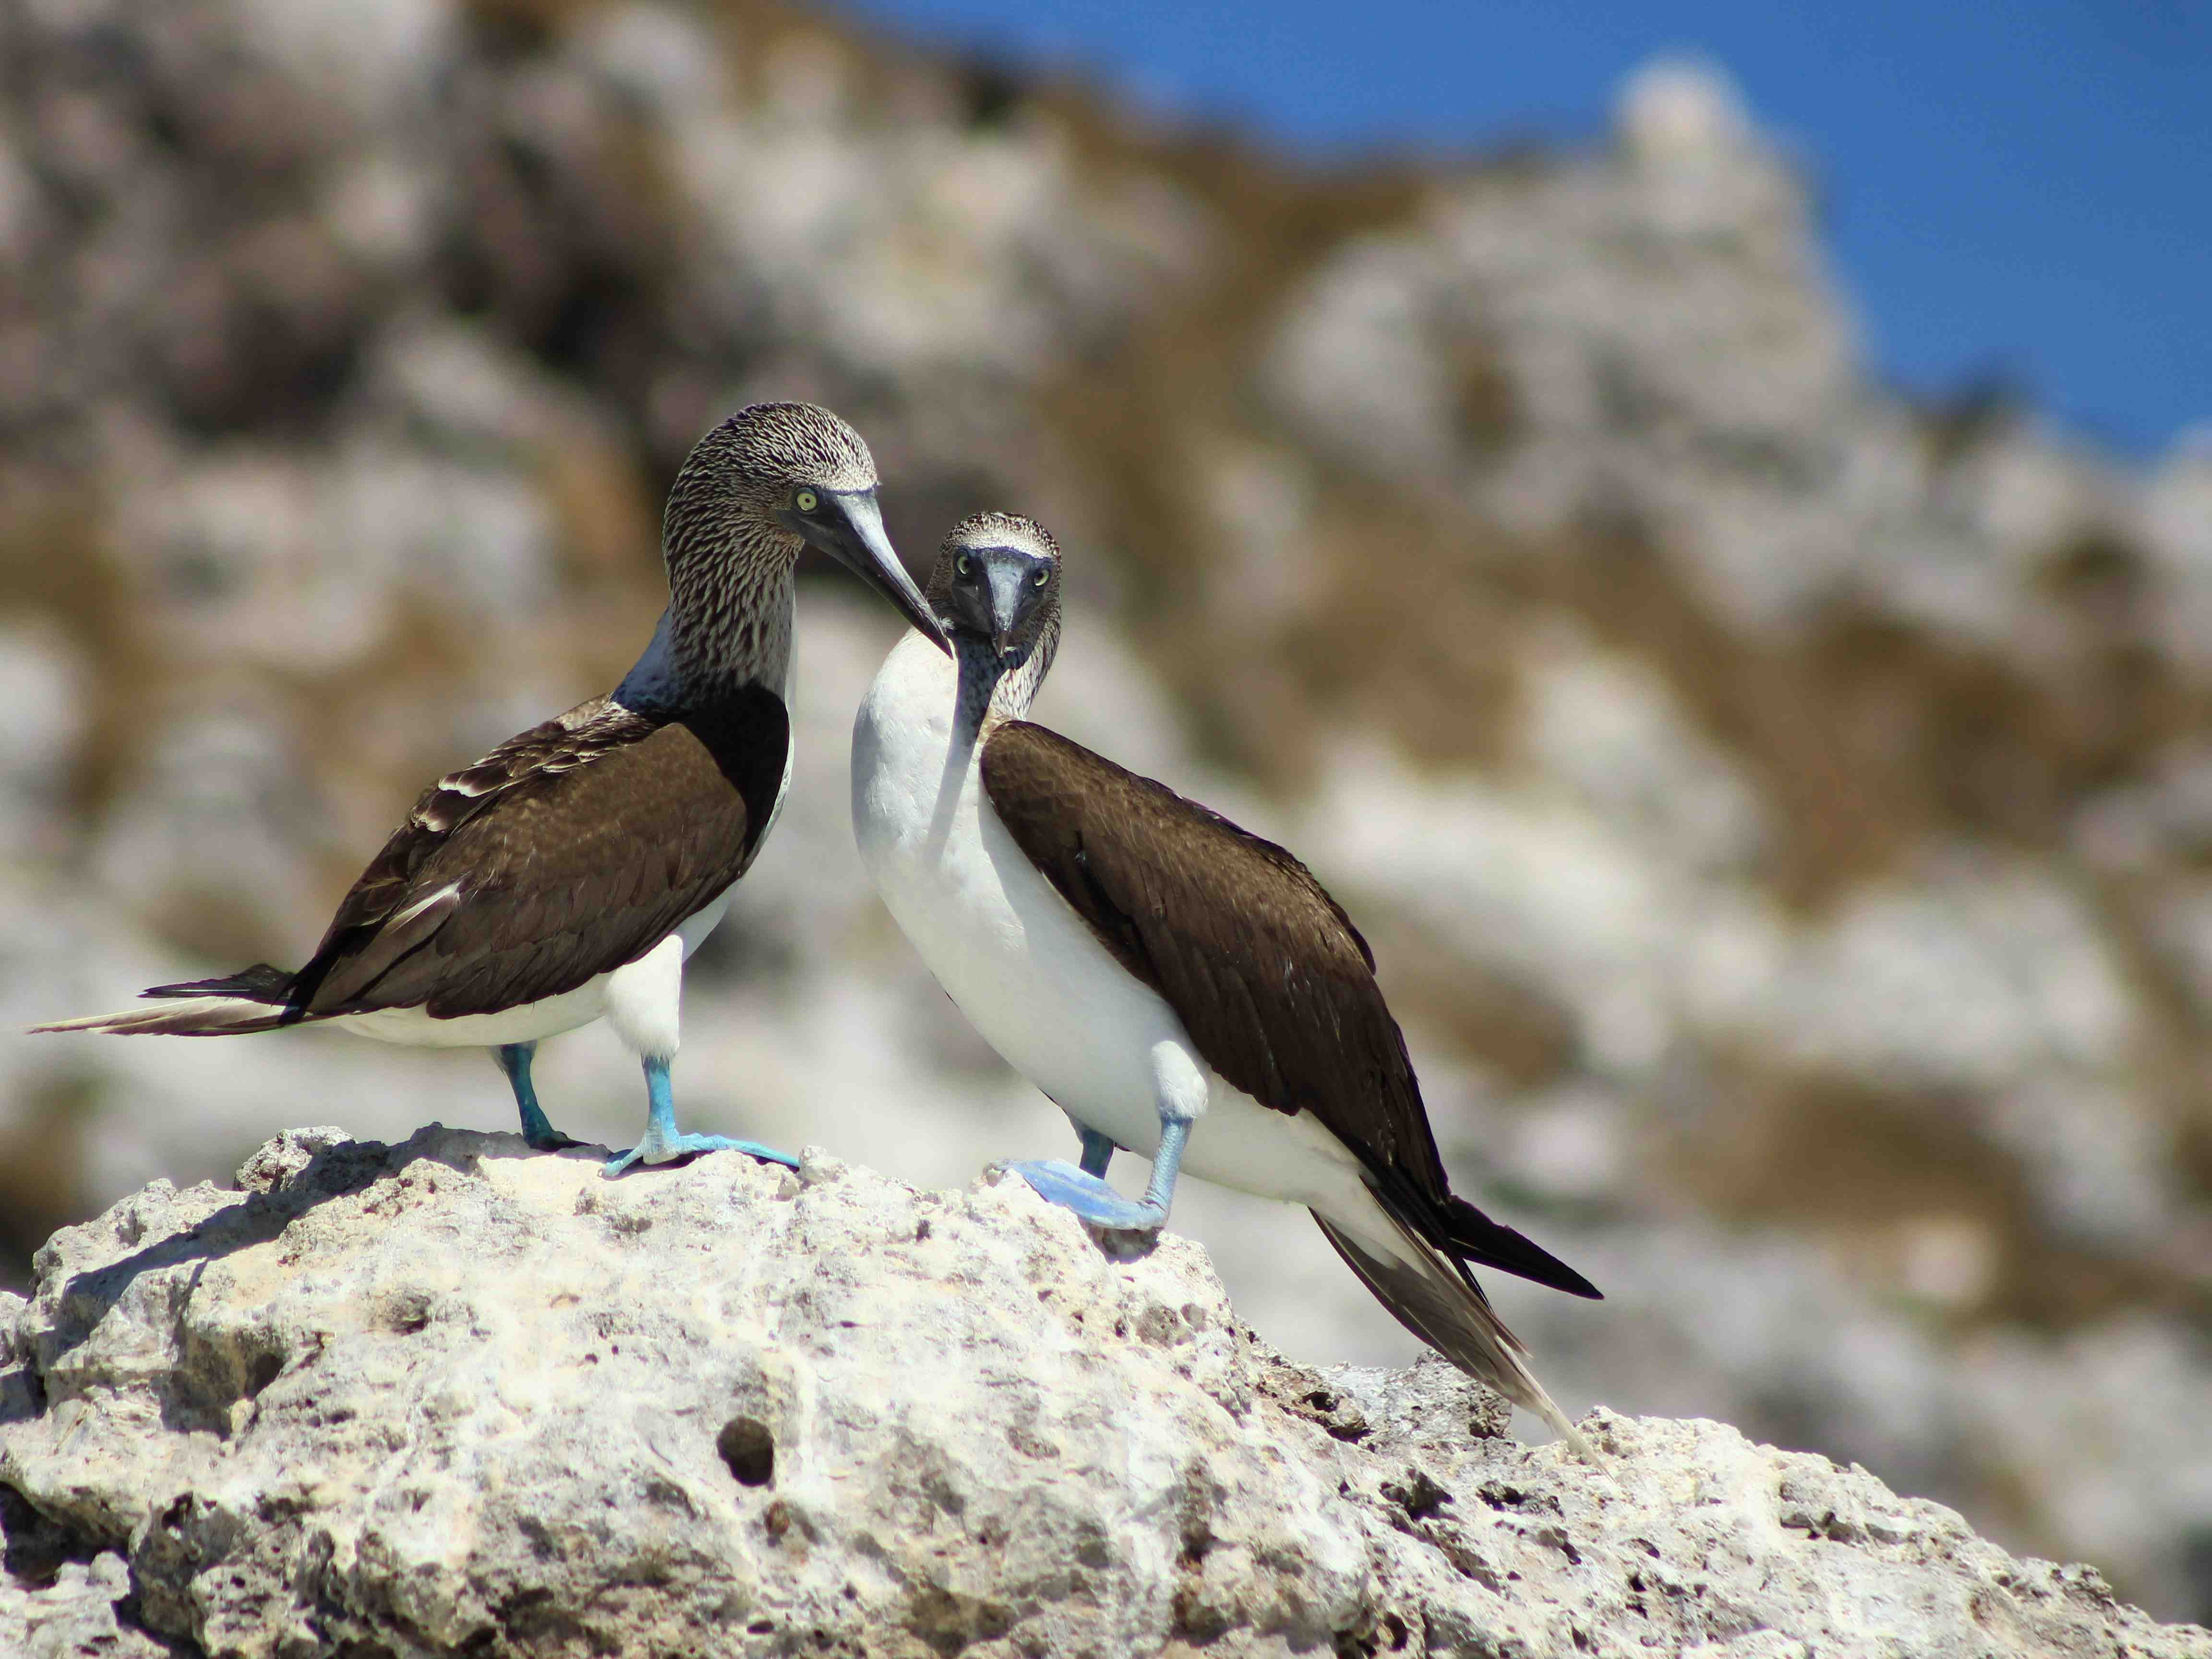 Marietas Eco-discovery - Last Minute Tours in Puerto Vallarta